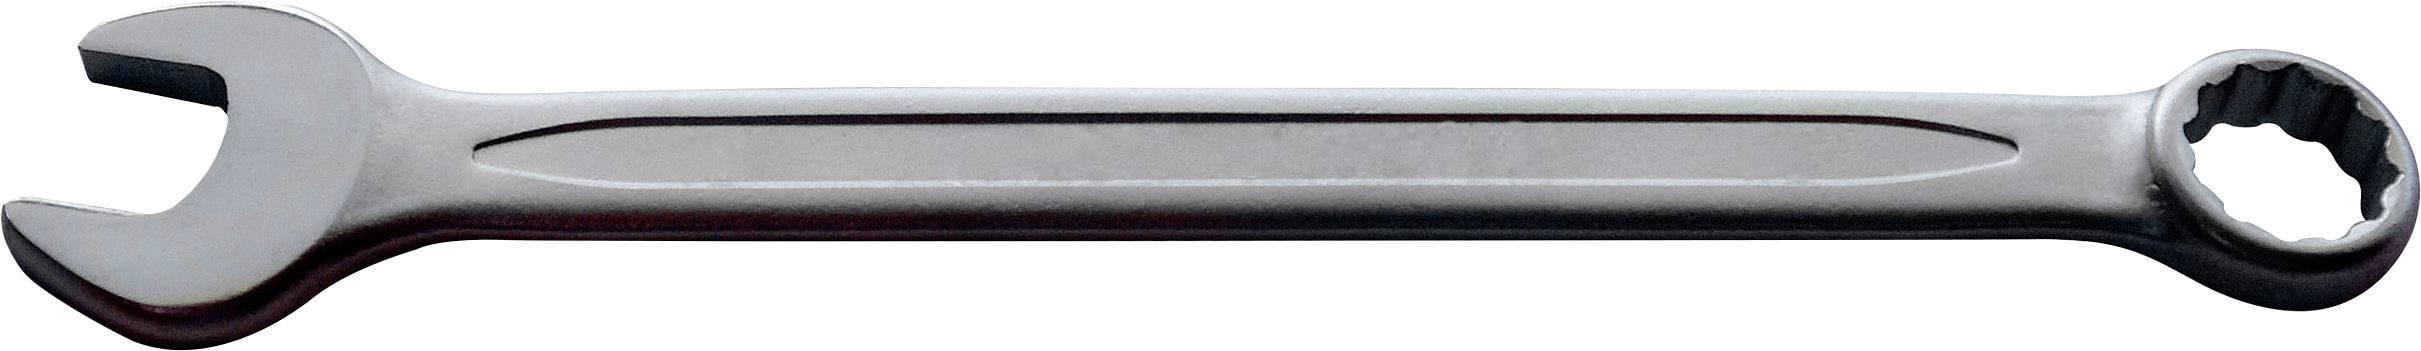 Očkoplochý klíč TOOLCRAFT 820838, N/A, 17 mm